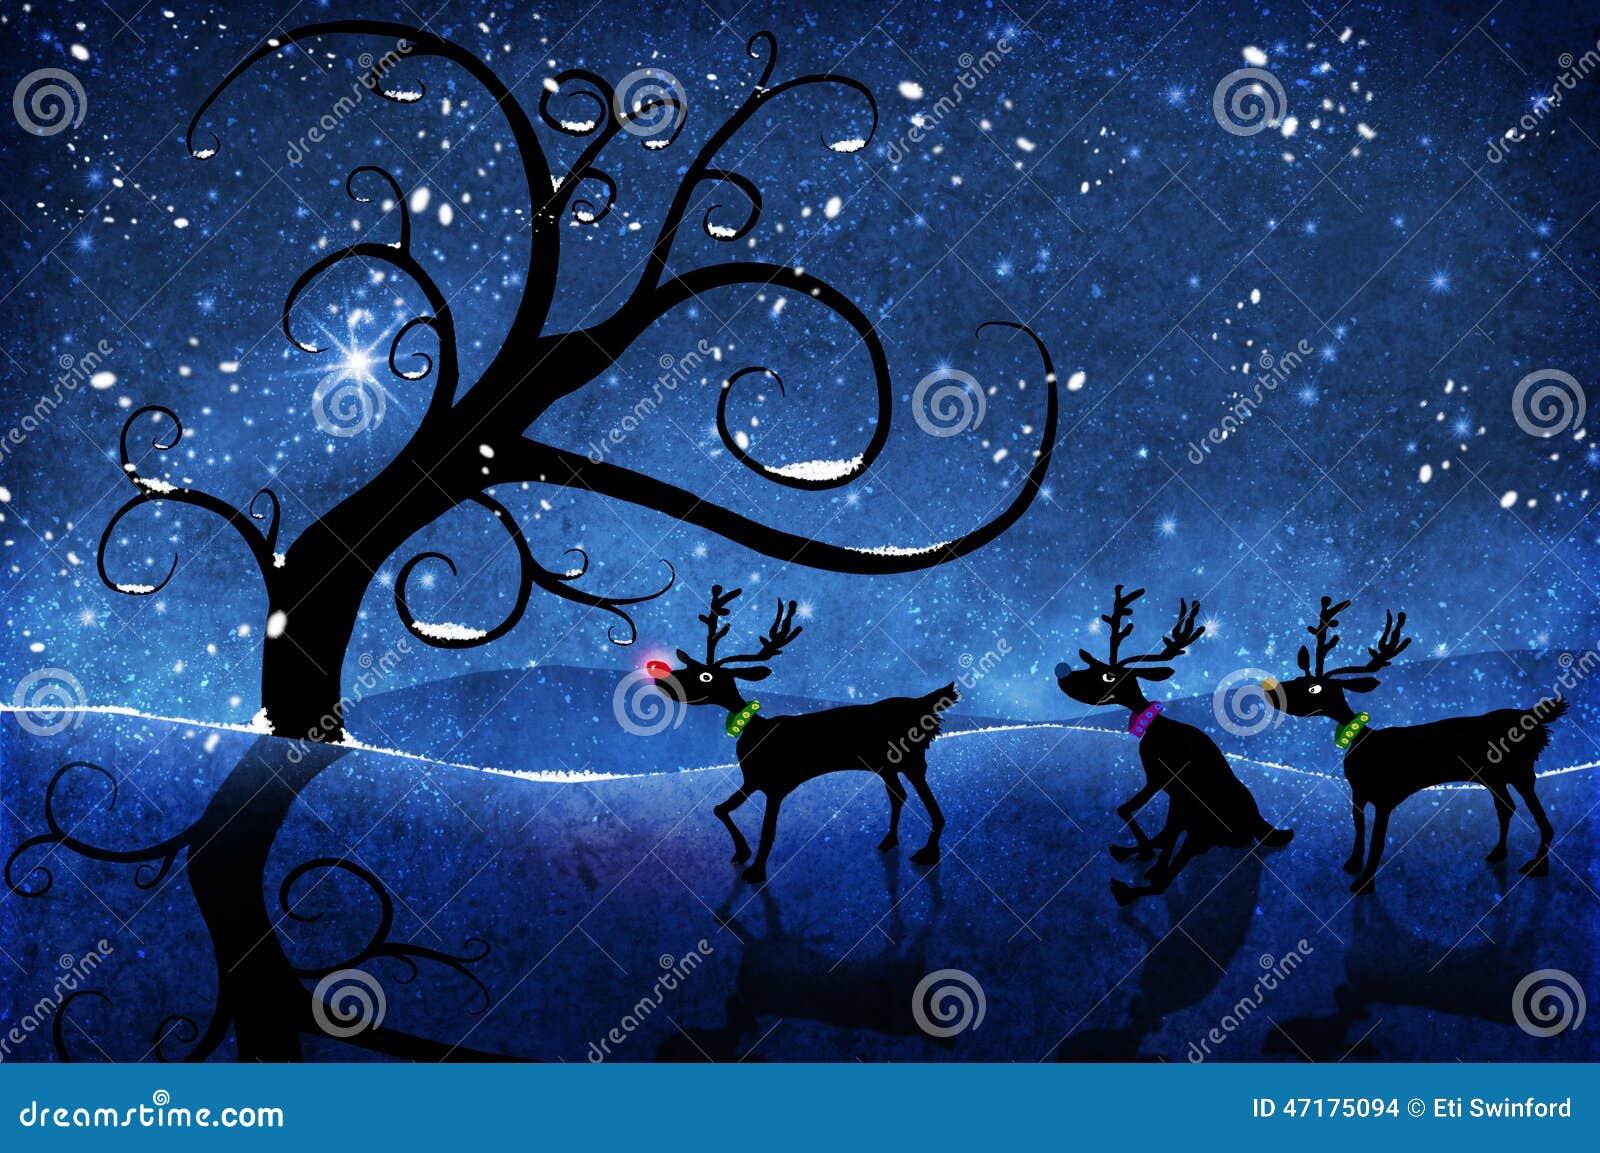 Rudolf and reindeer